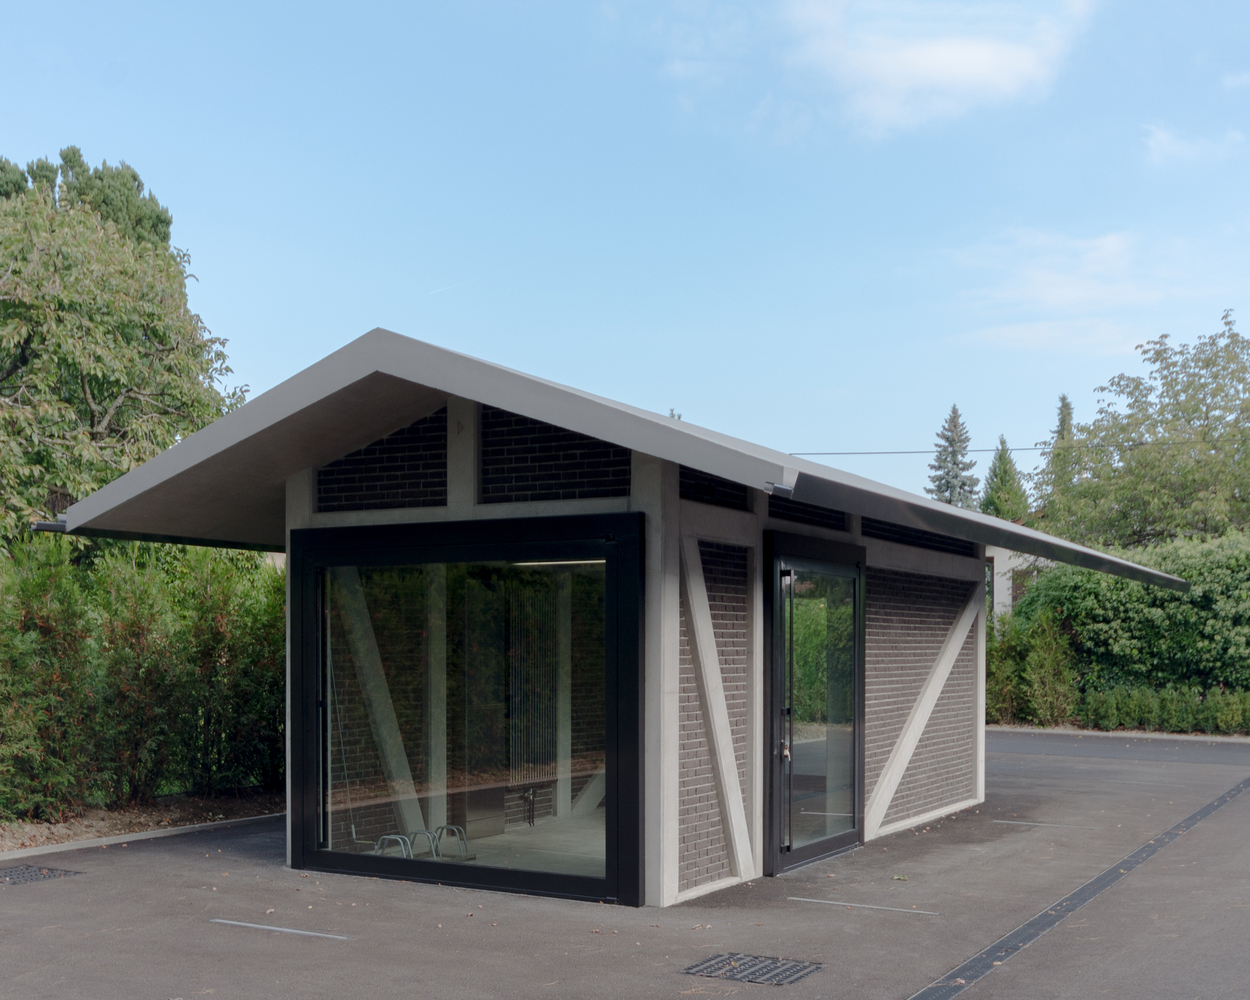 Дизайн гаража с навесом - фото 3